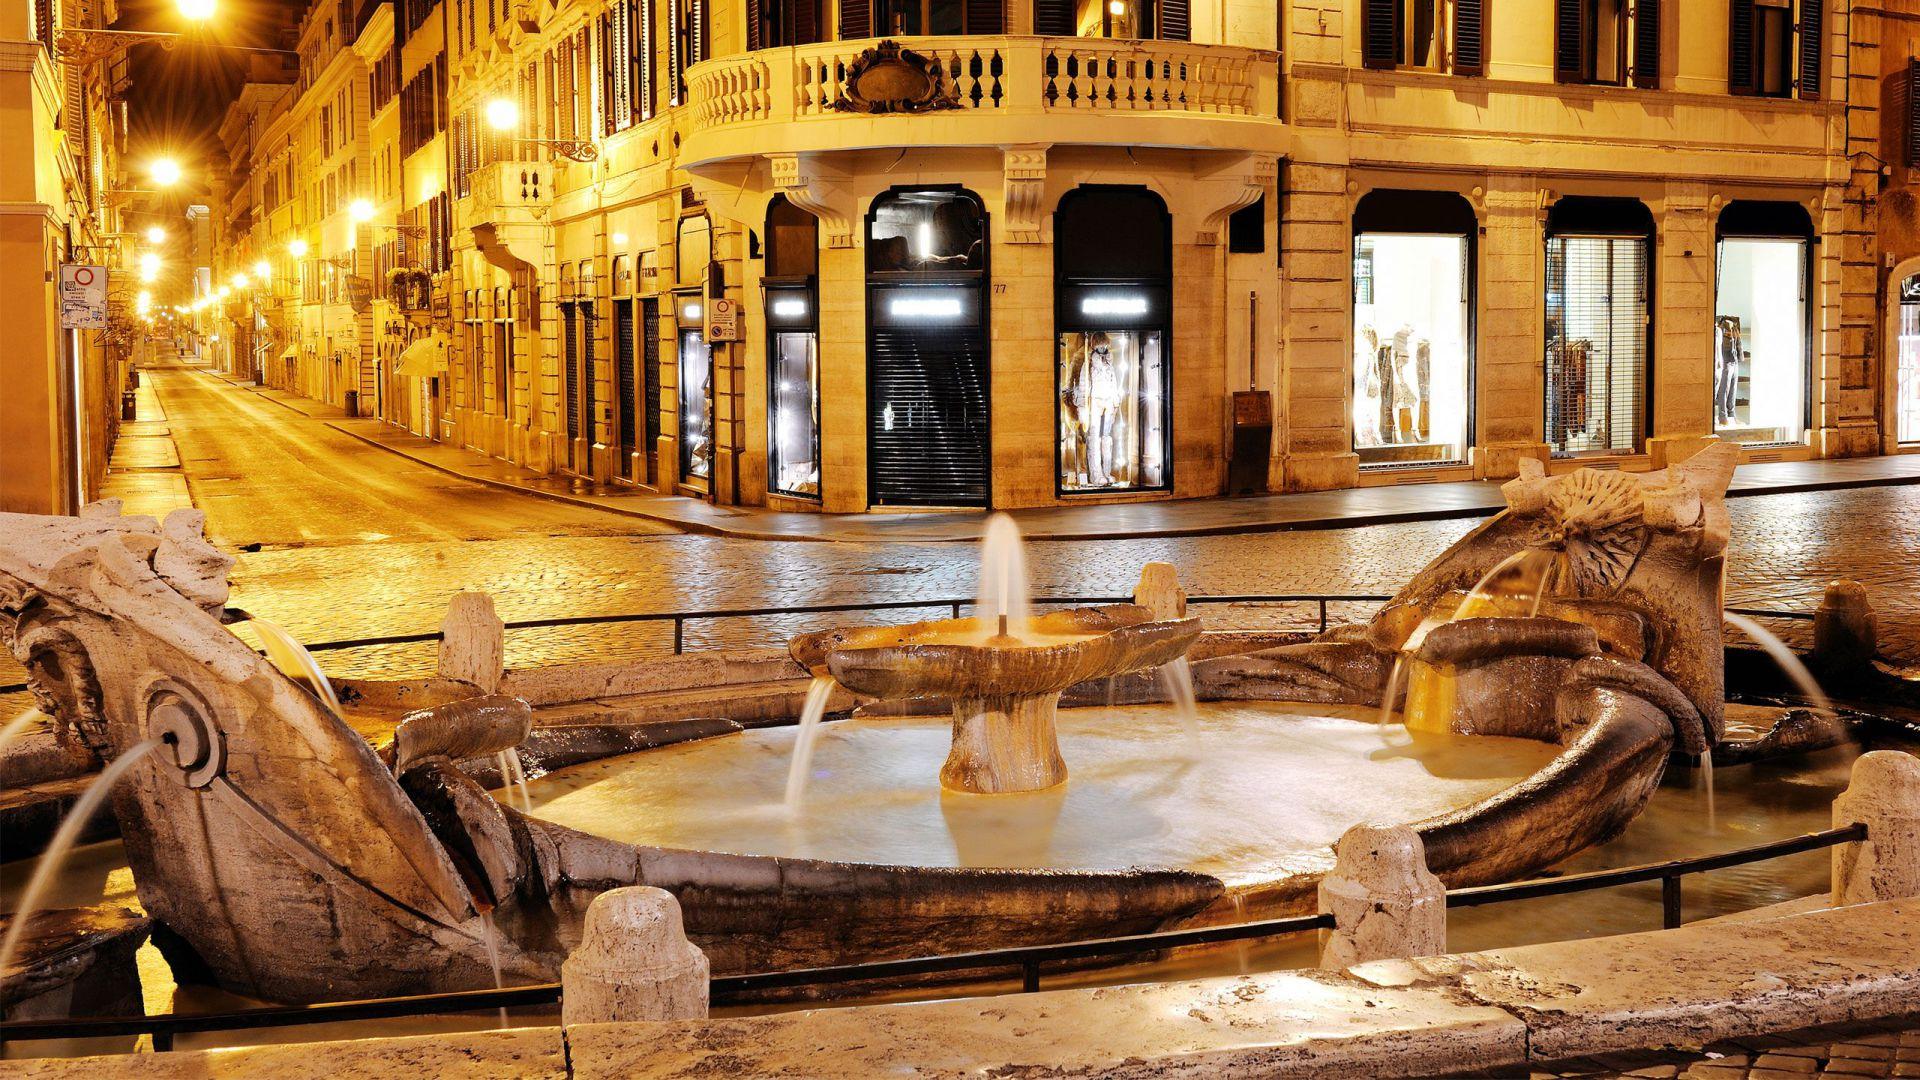 San-Carlo-Suite-Rome-piazza-di-spagna